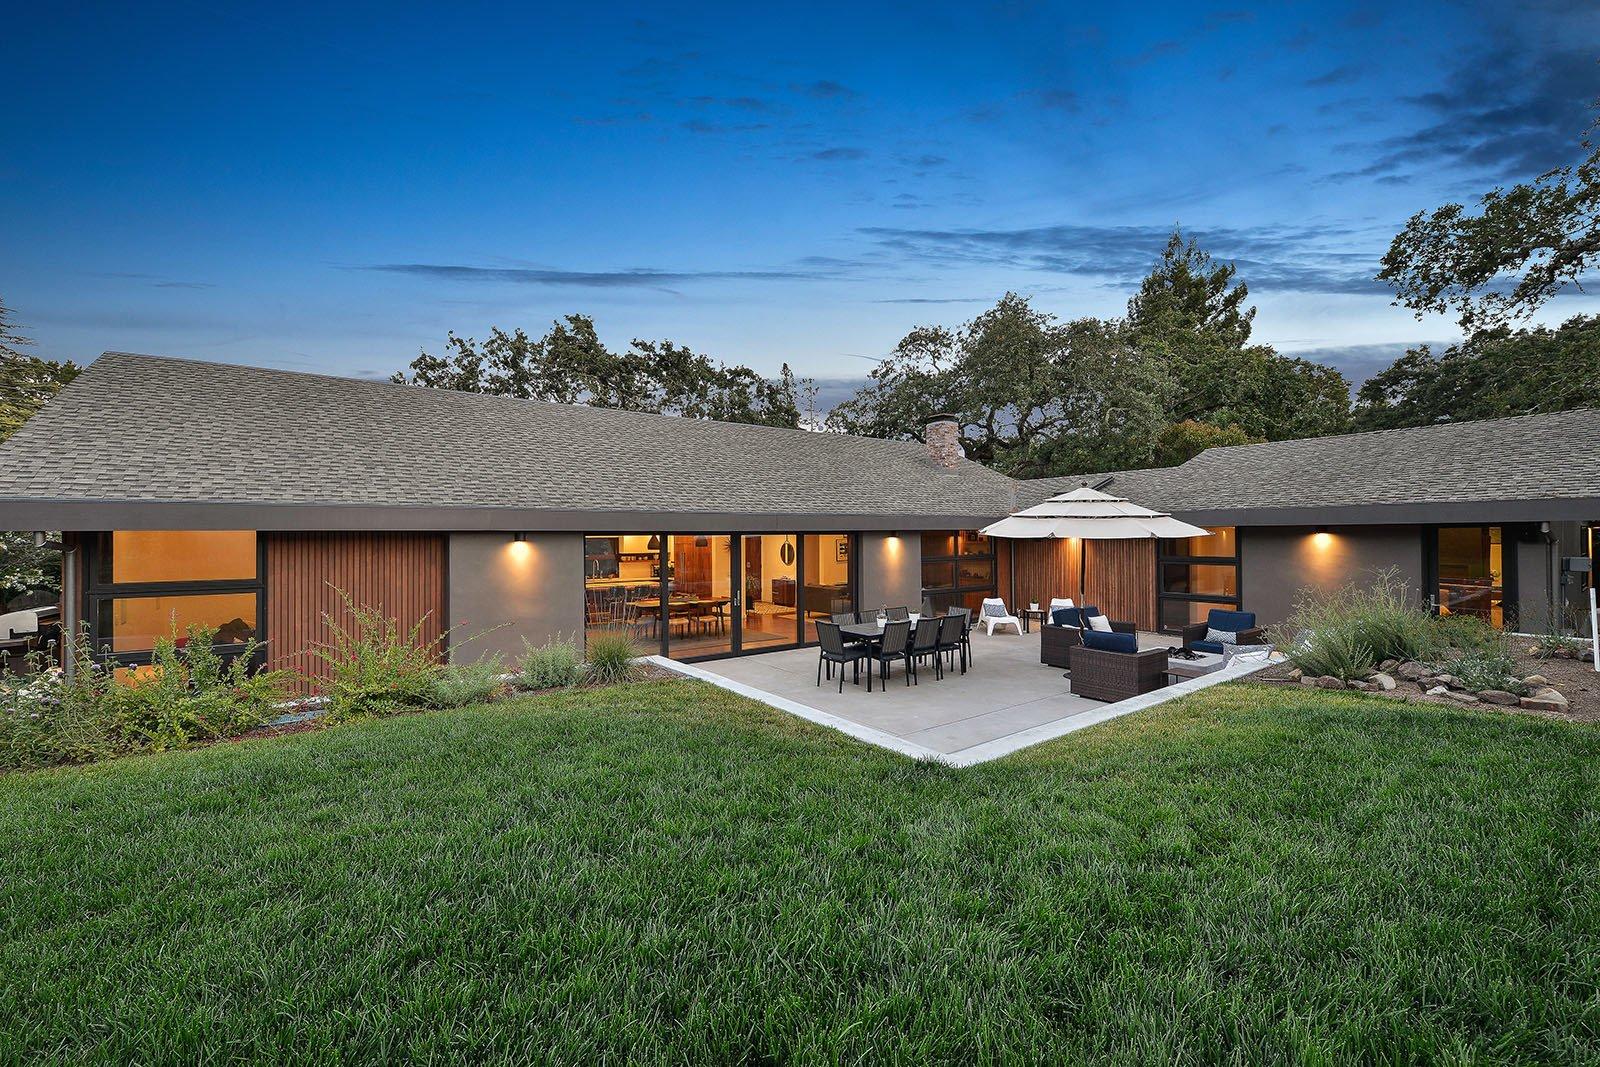 Rear yard  Portola Valley by patrick perez/designpad architecture